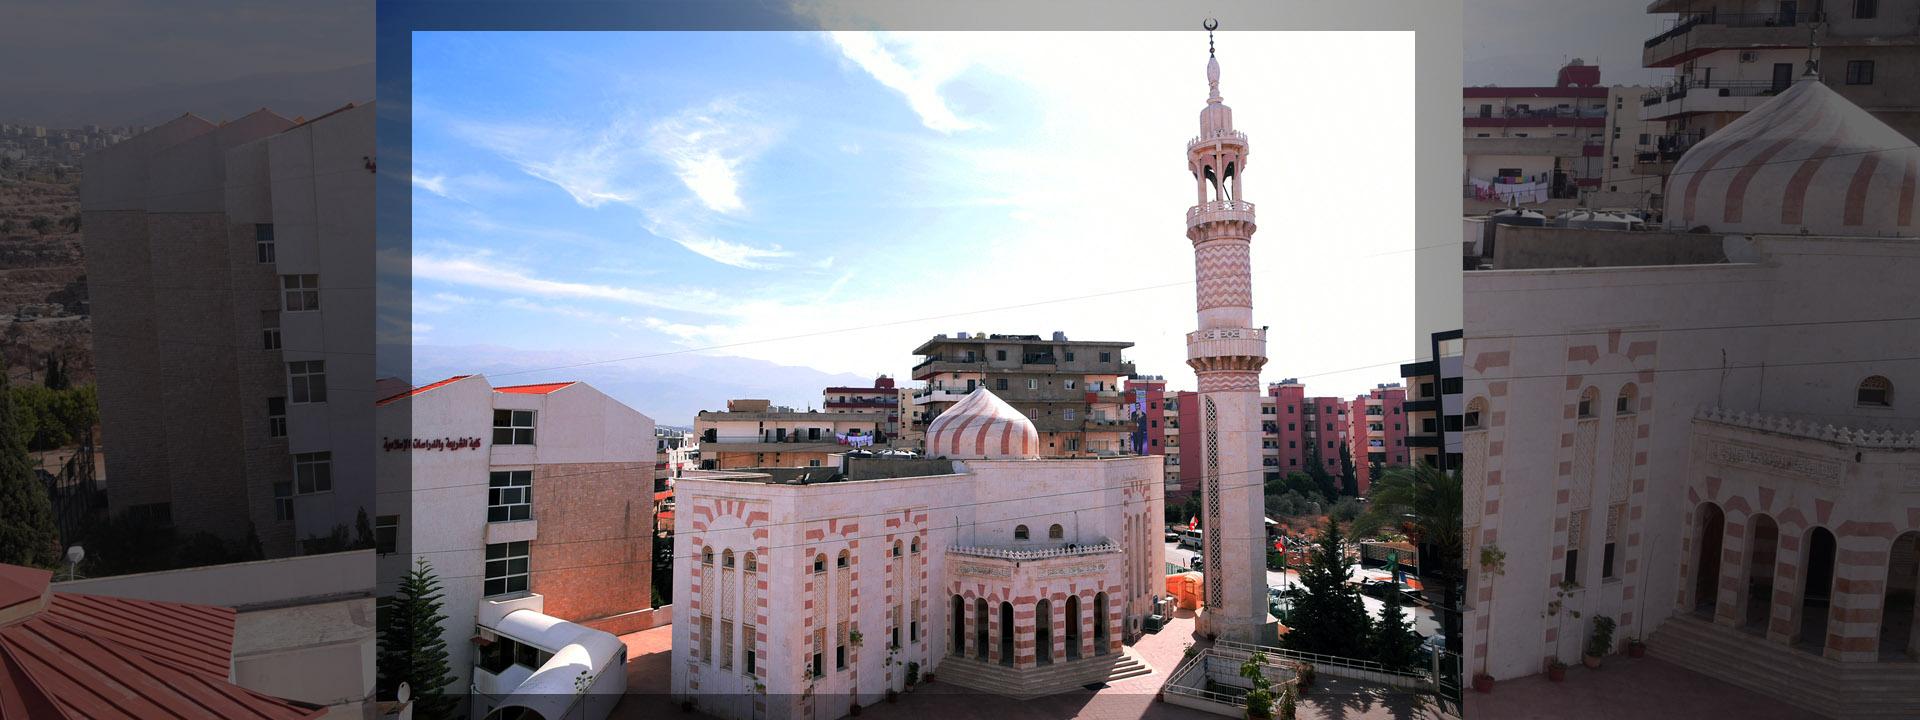 Mosque (2/2)